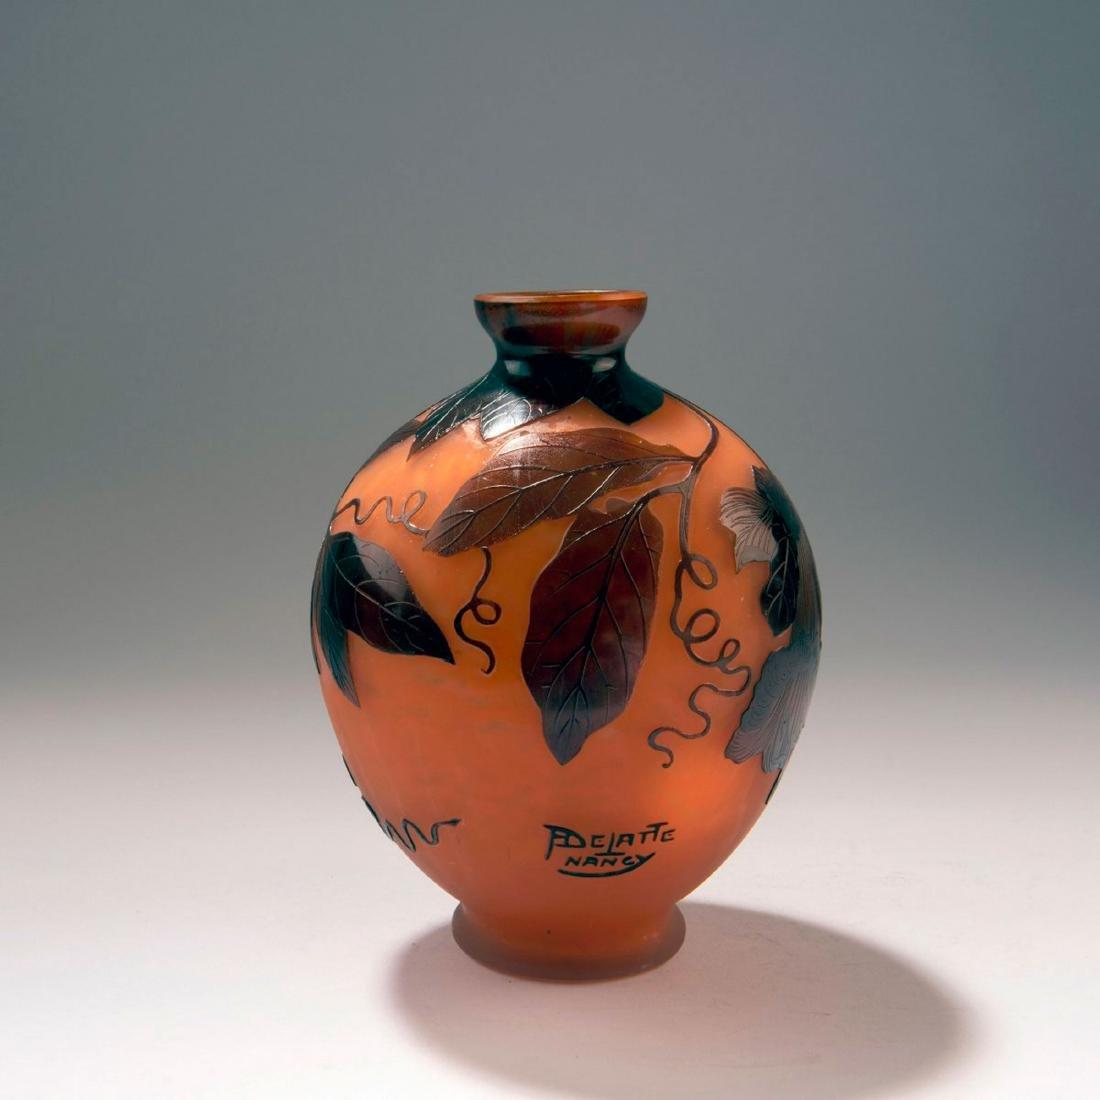 'Bignogne' vase, 1920s - 2